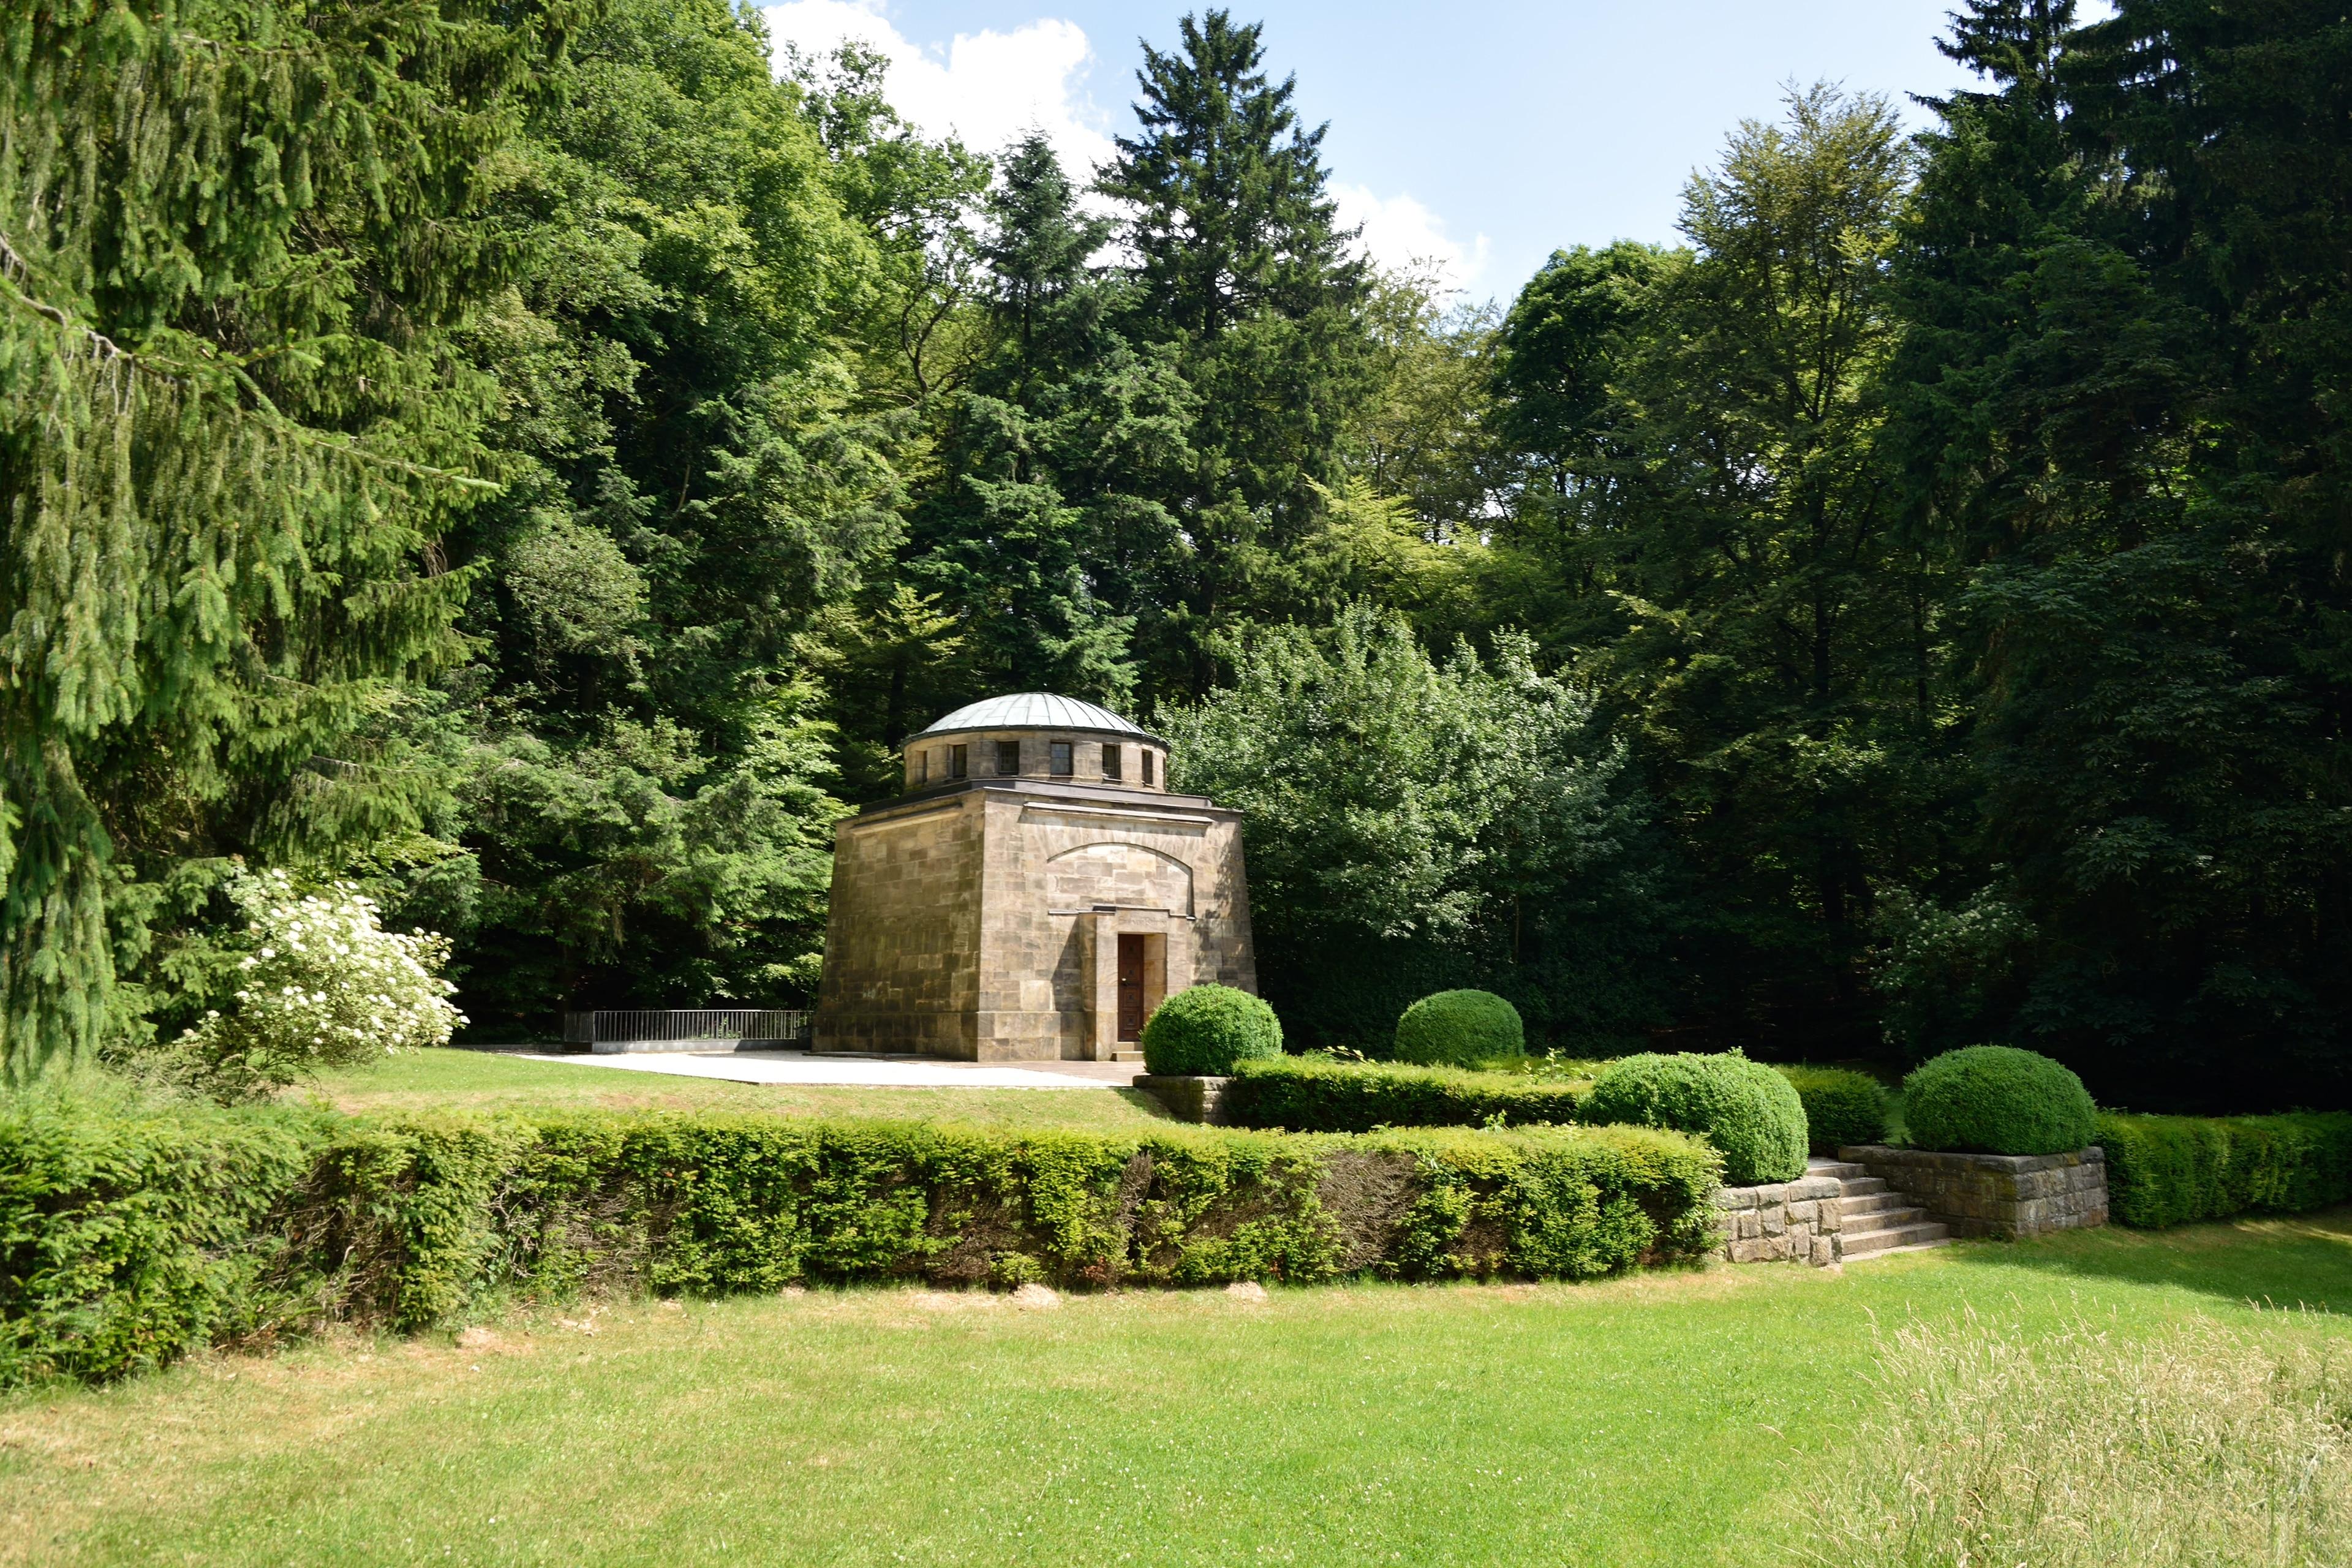 Wehrda (Marburg), Marburg, Hessen, Duitsland